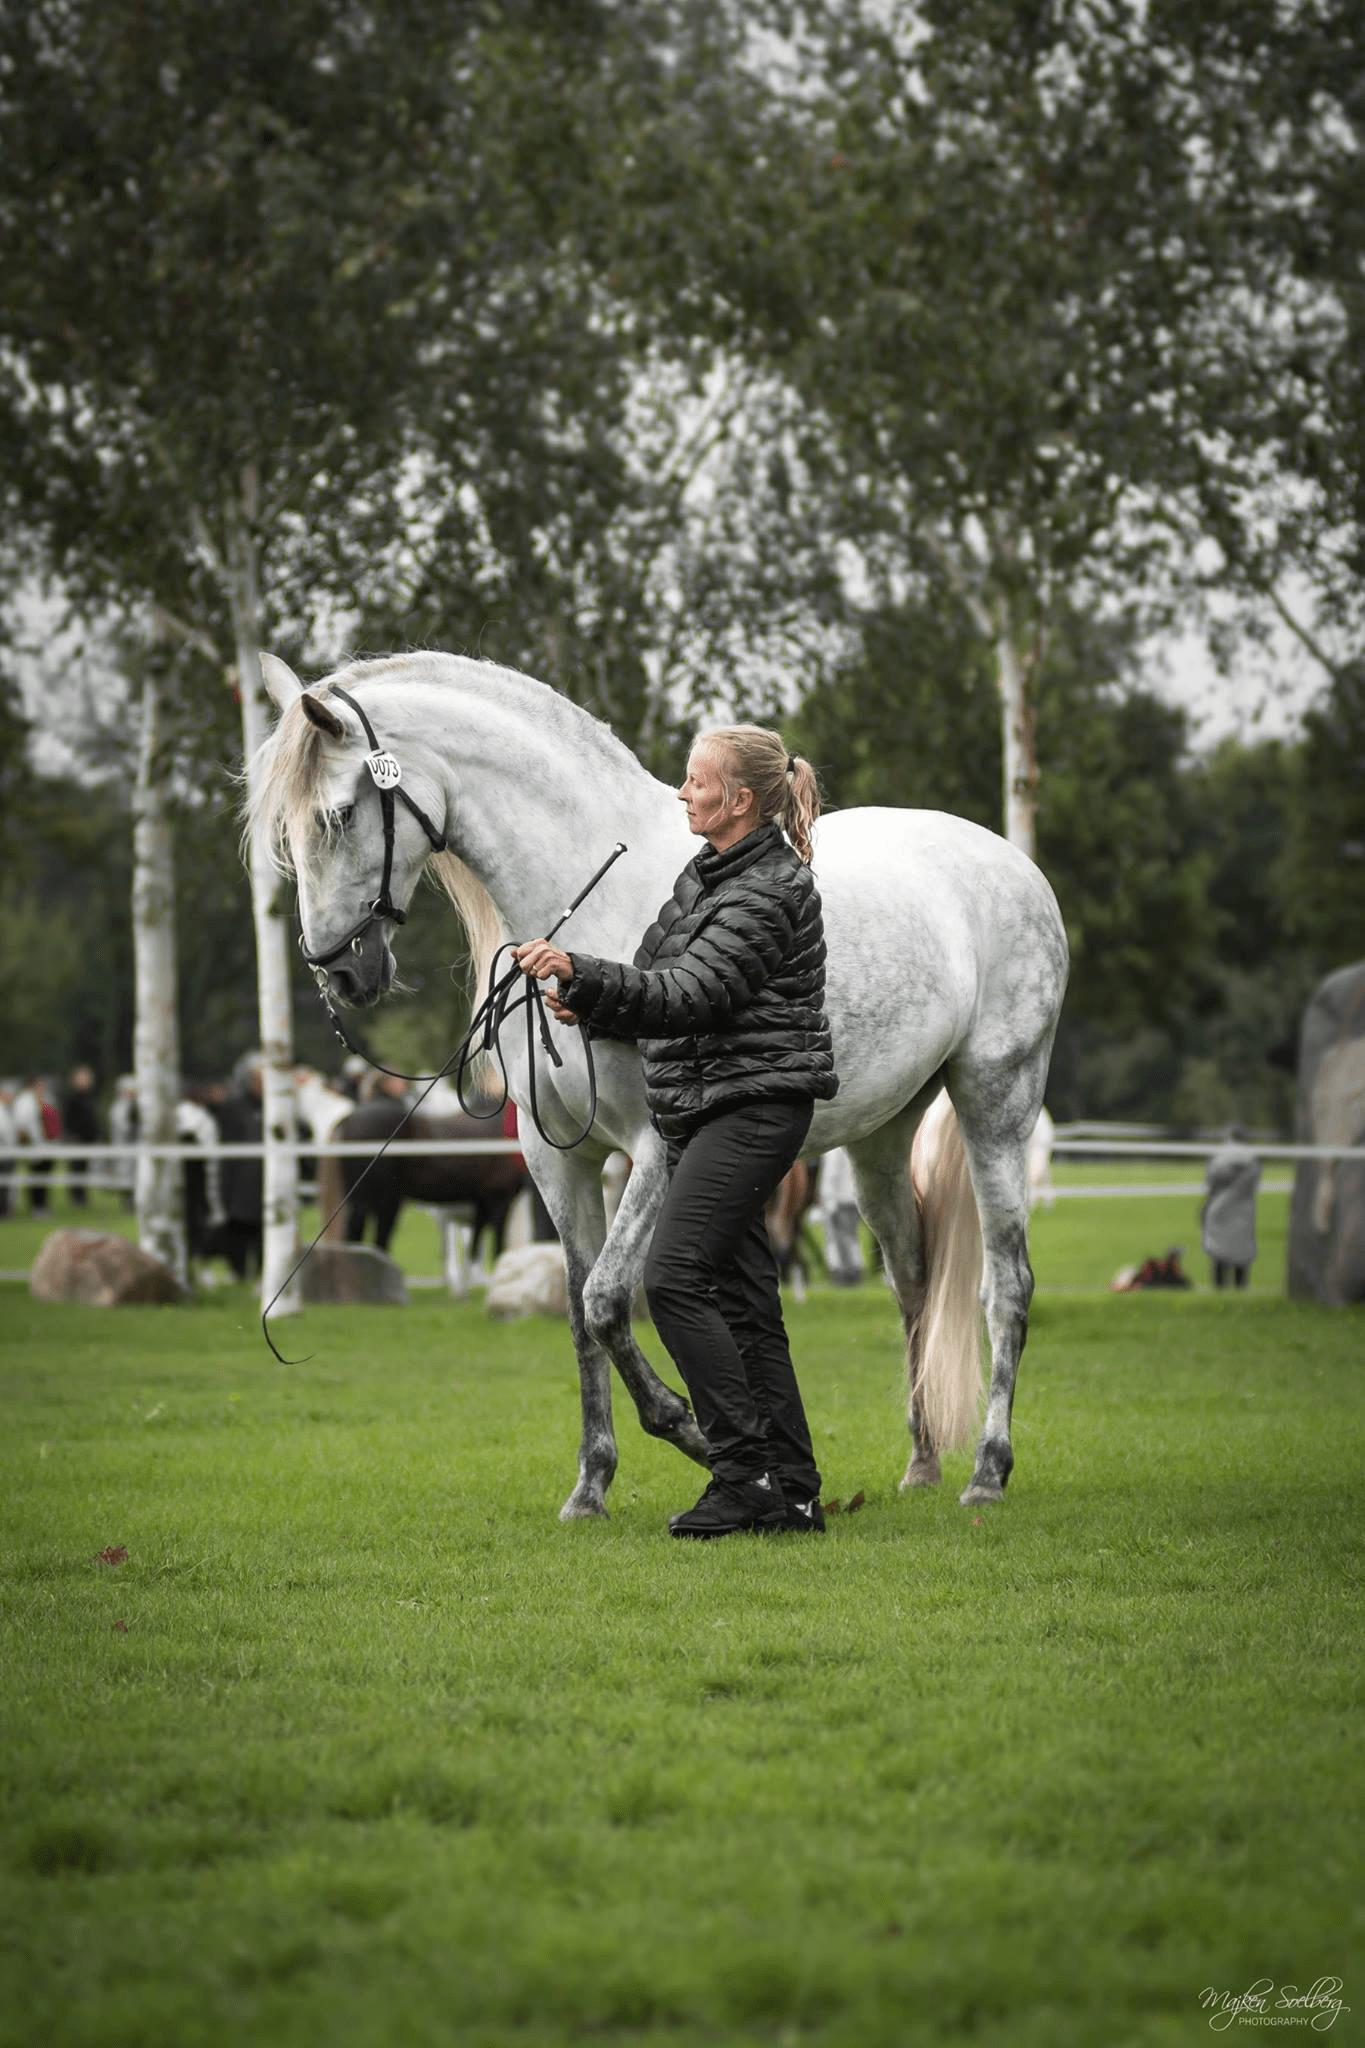 Tina med hest